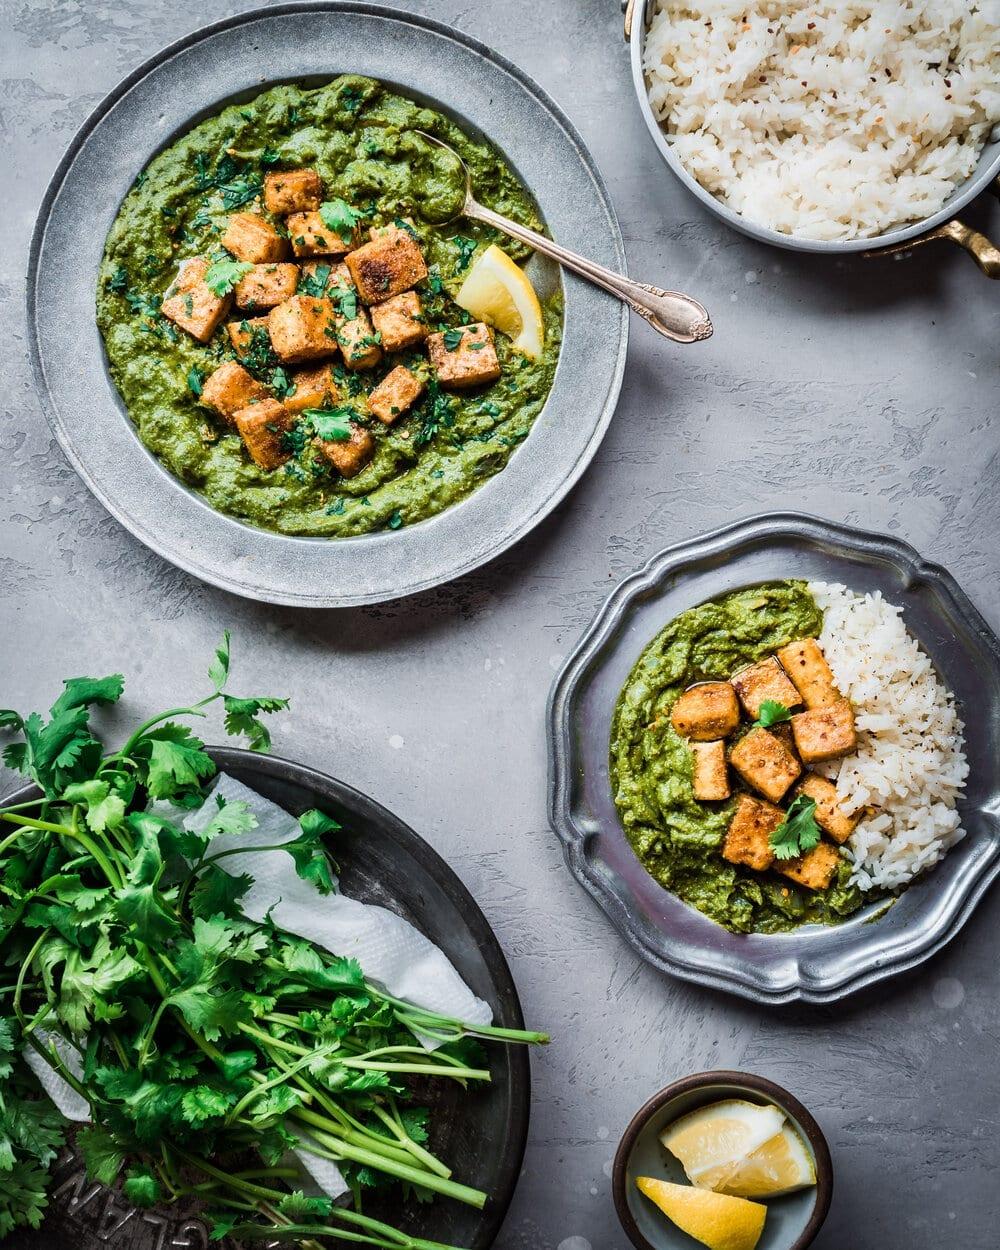 Vegan Palak Paneer with Tofu. Vegan Palak Tofu Paneer.